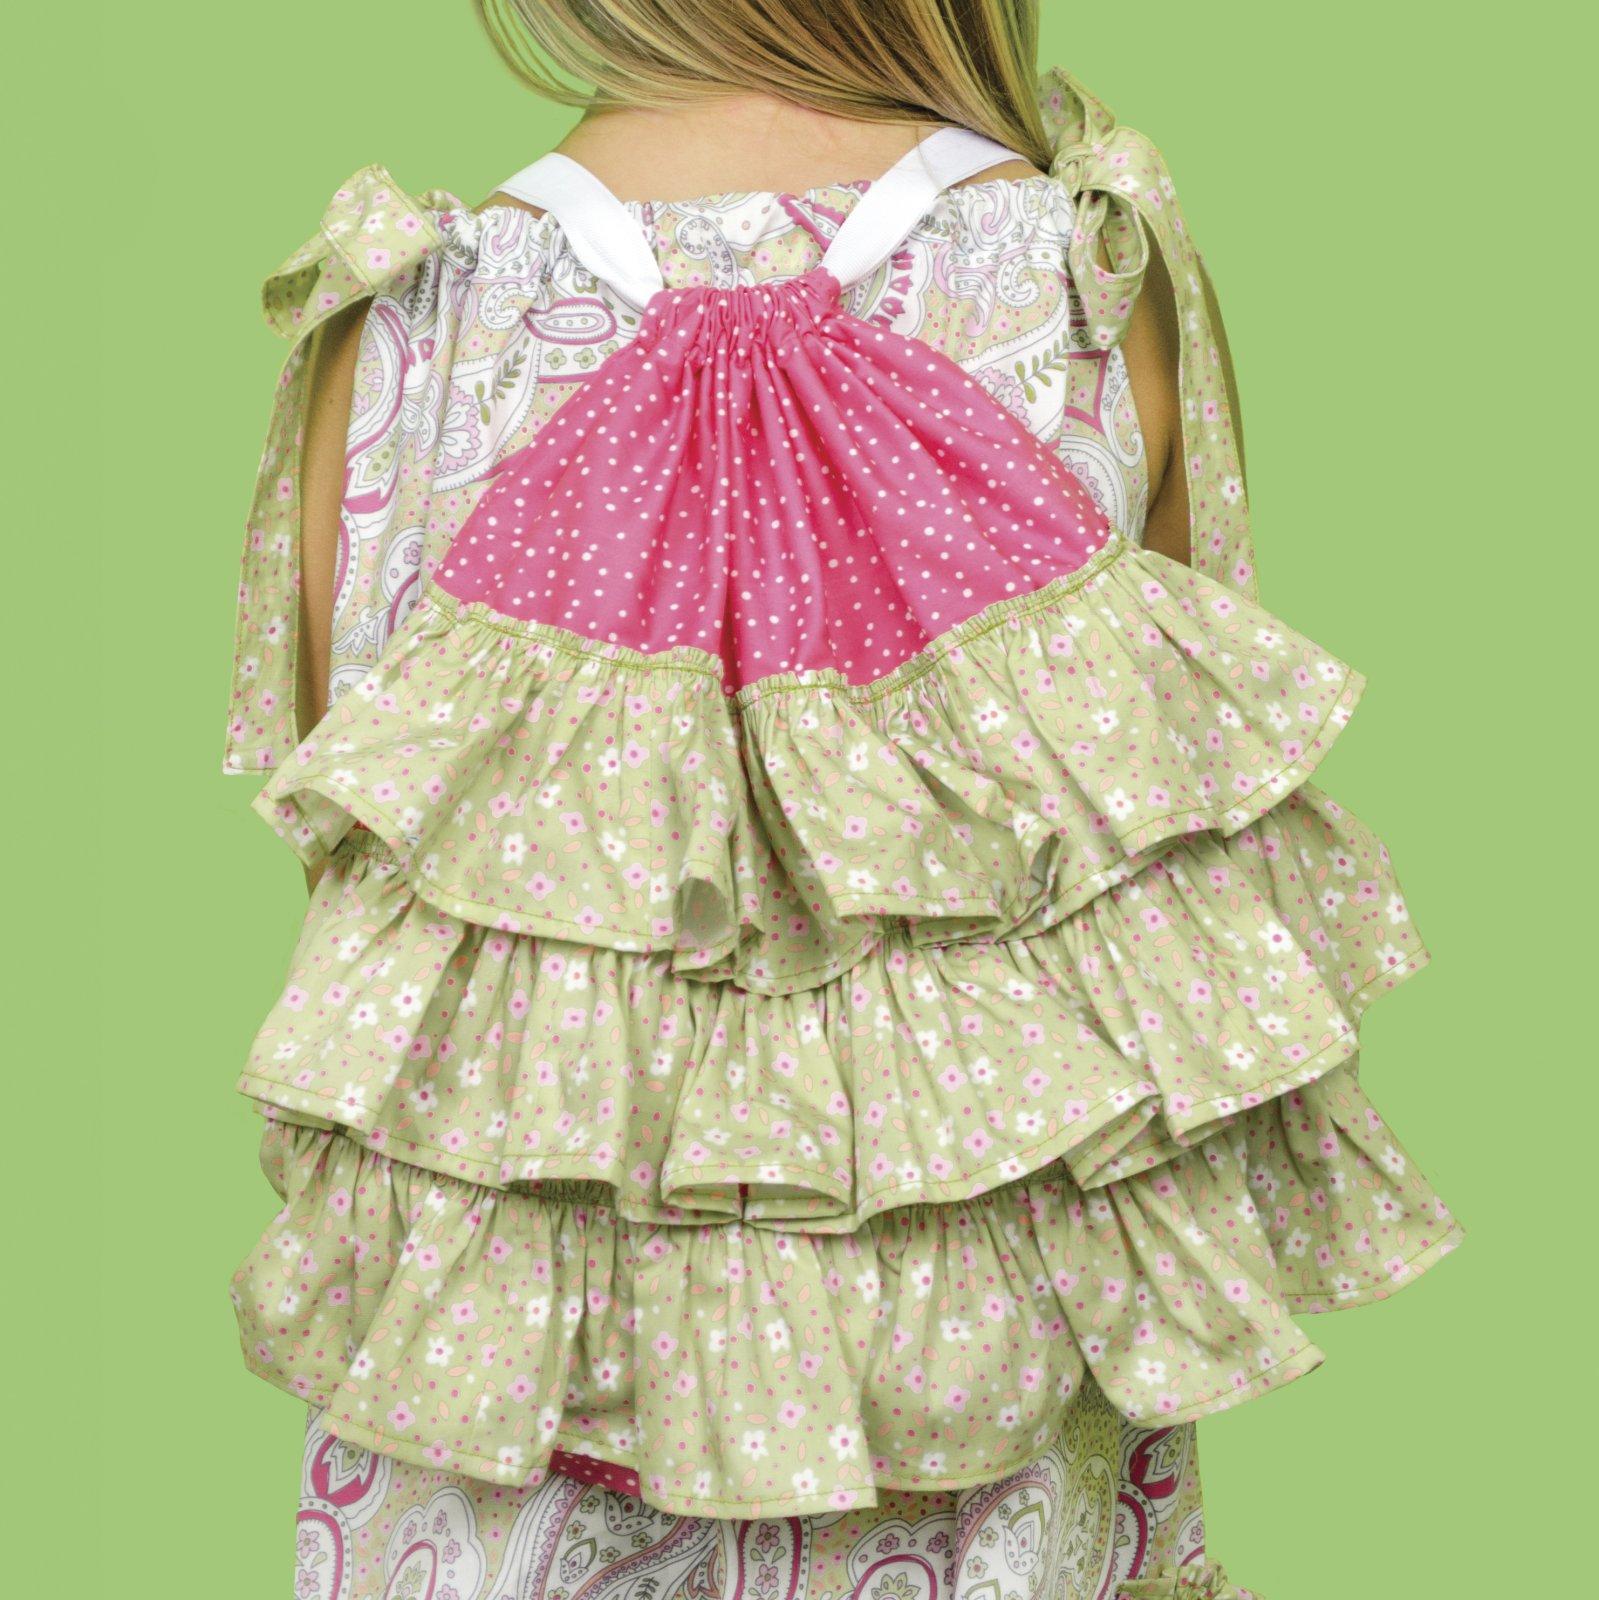 Little Dress Boutique II - Ruffles Backpack c8e716a0a